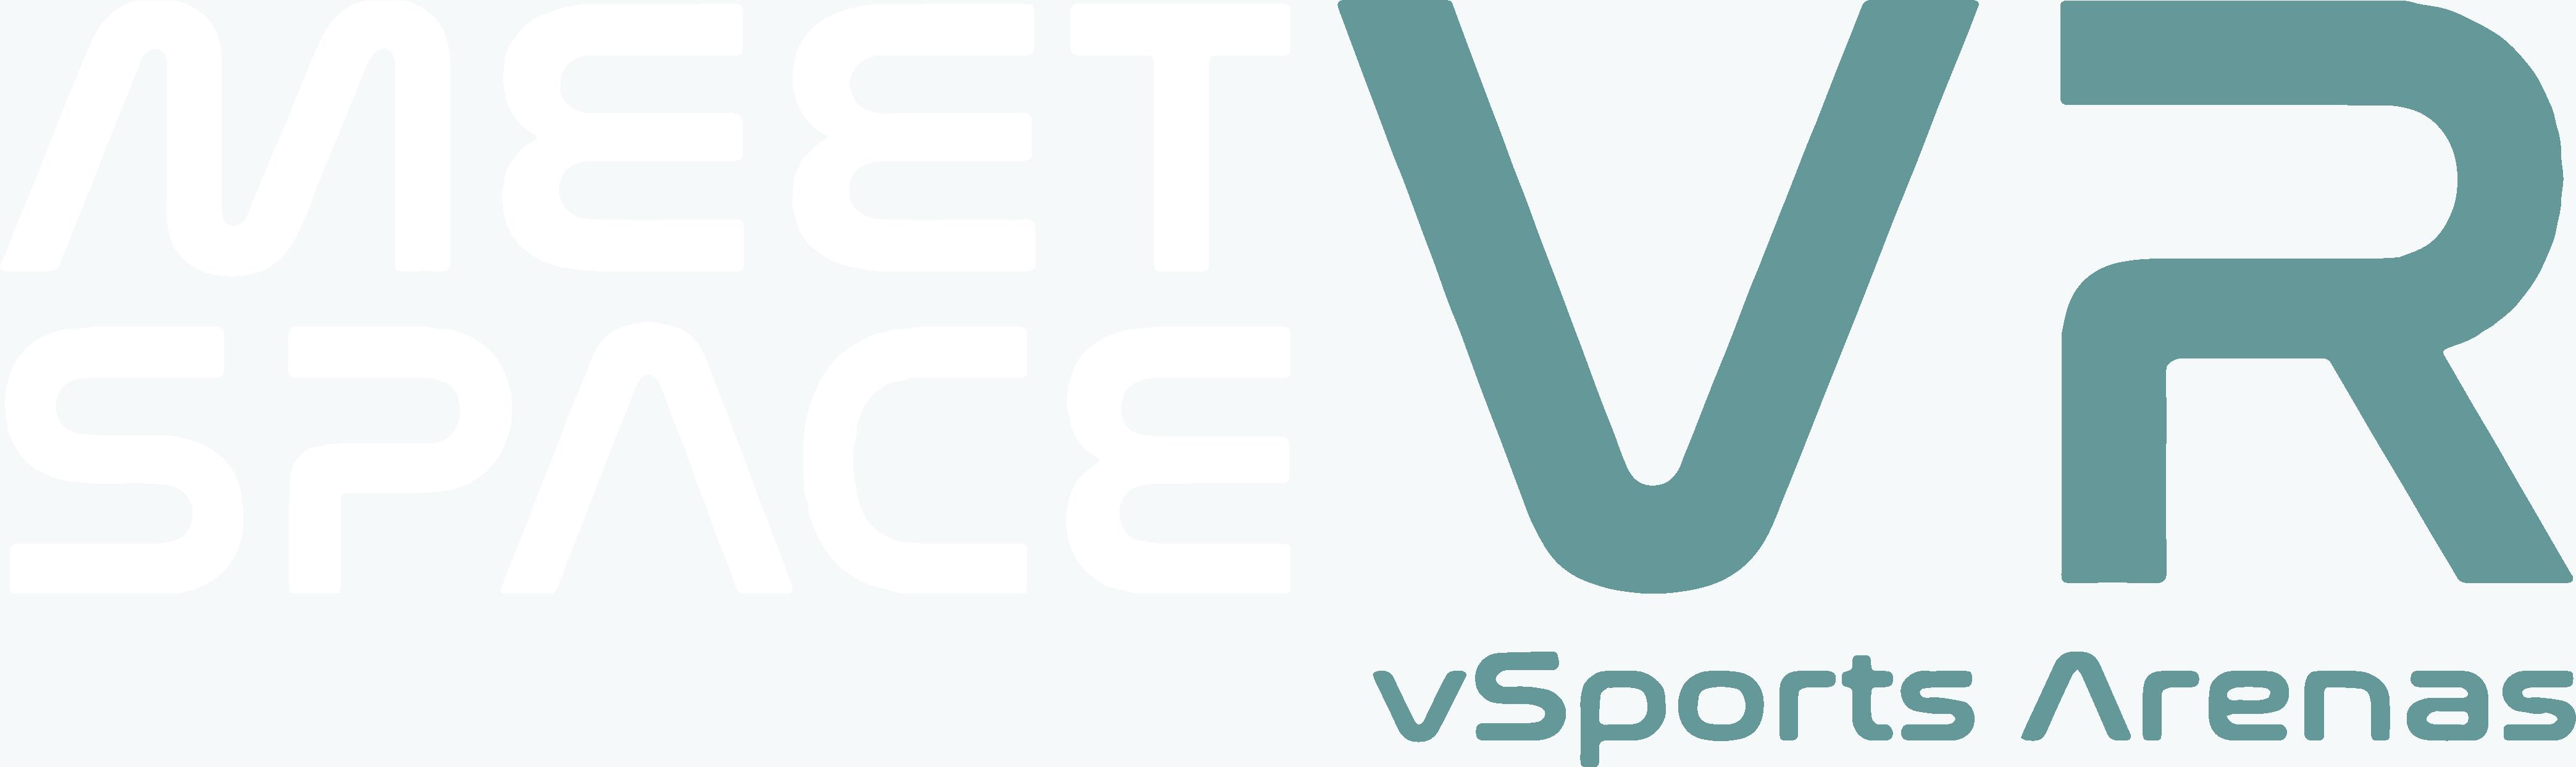 meetspaceVR Logo vSports - Inverse